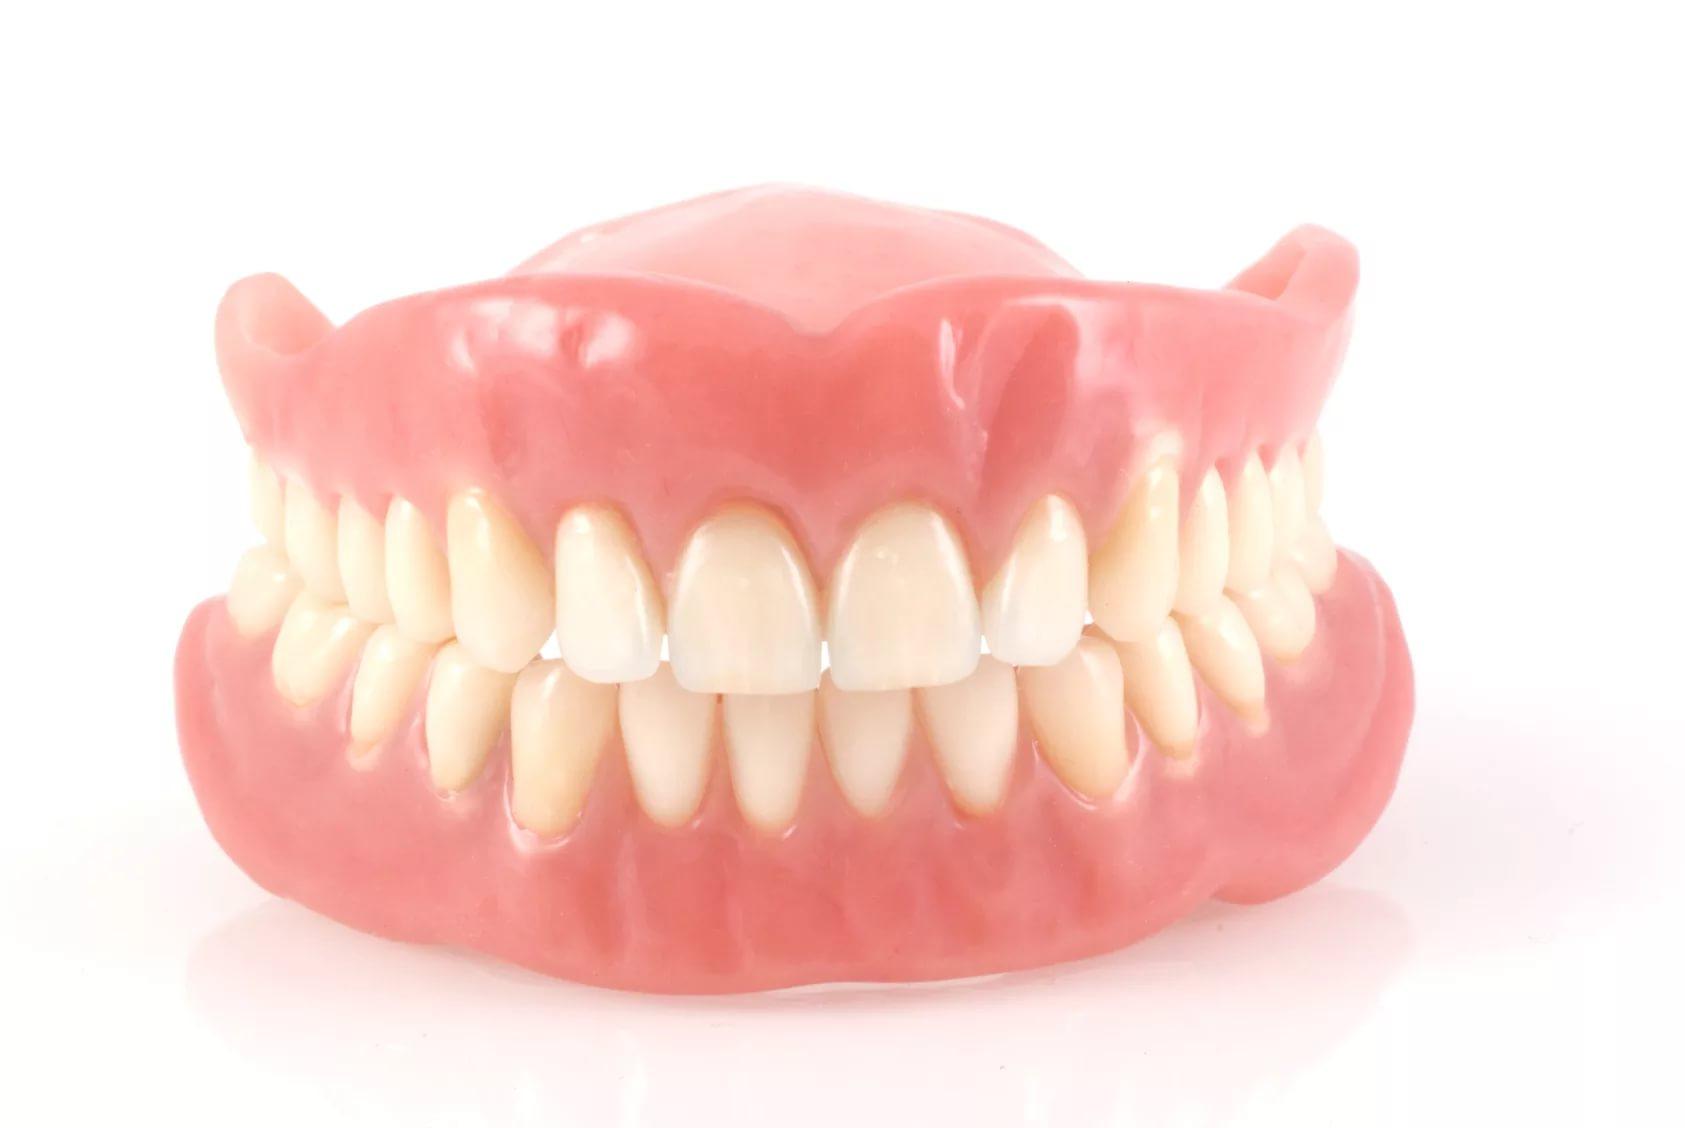 صور طقم اسنان , افضل حل لتساقط الاسنان